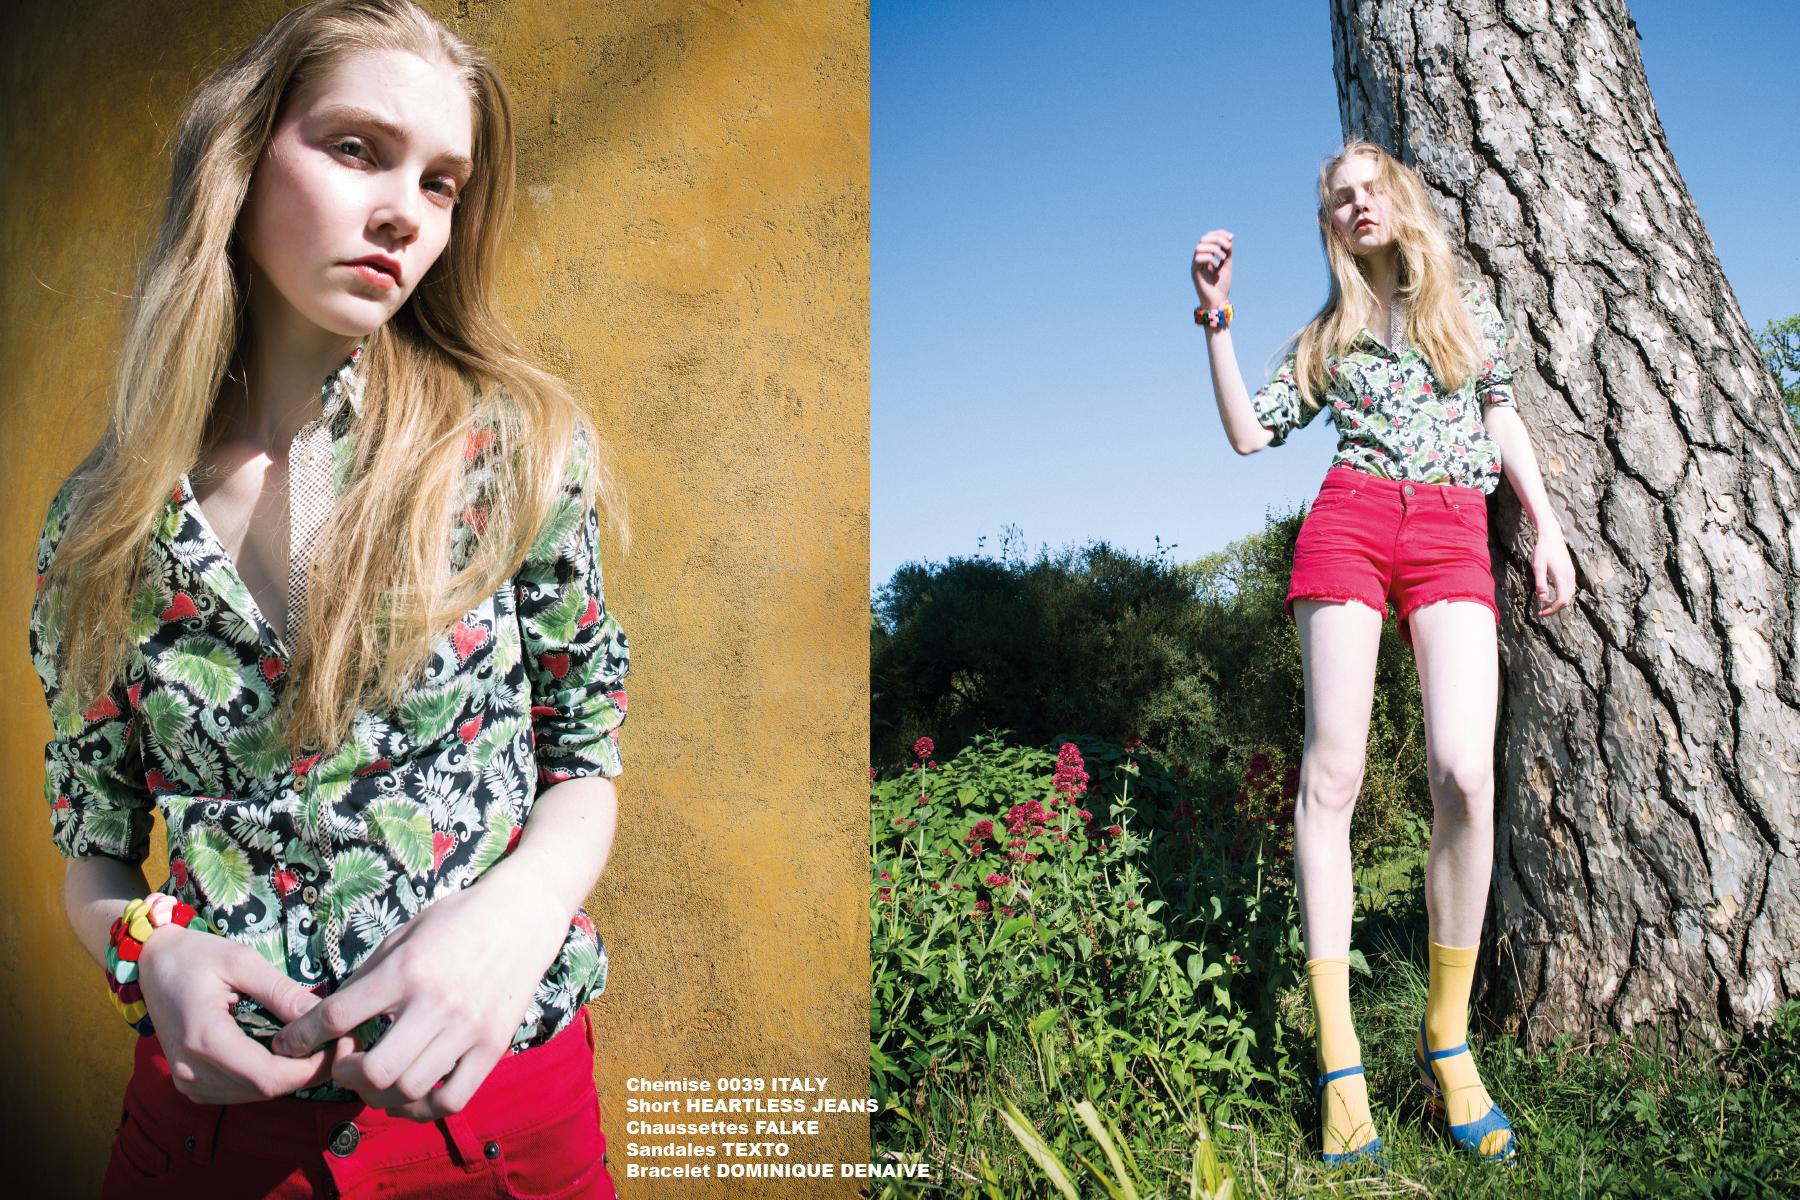 PascaleLourmand_JusteMagazine_GardenParty_Daria-3